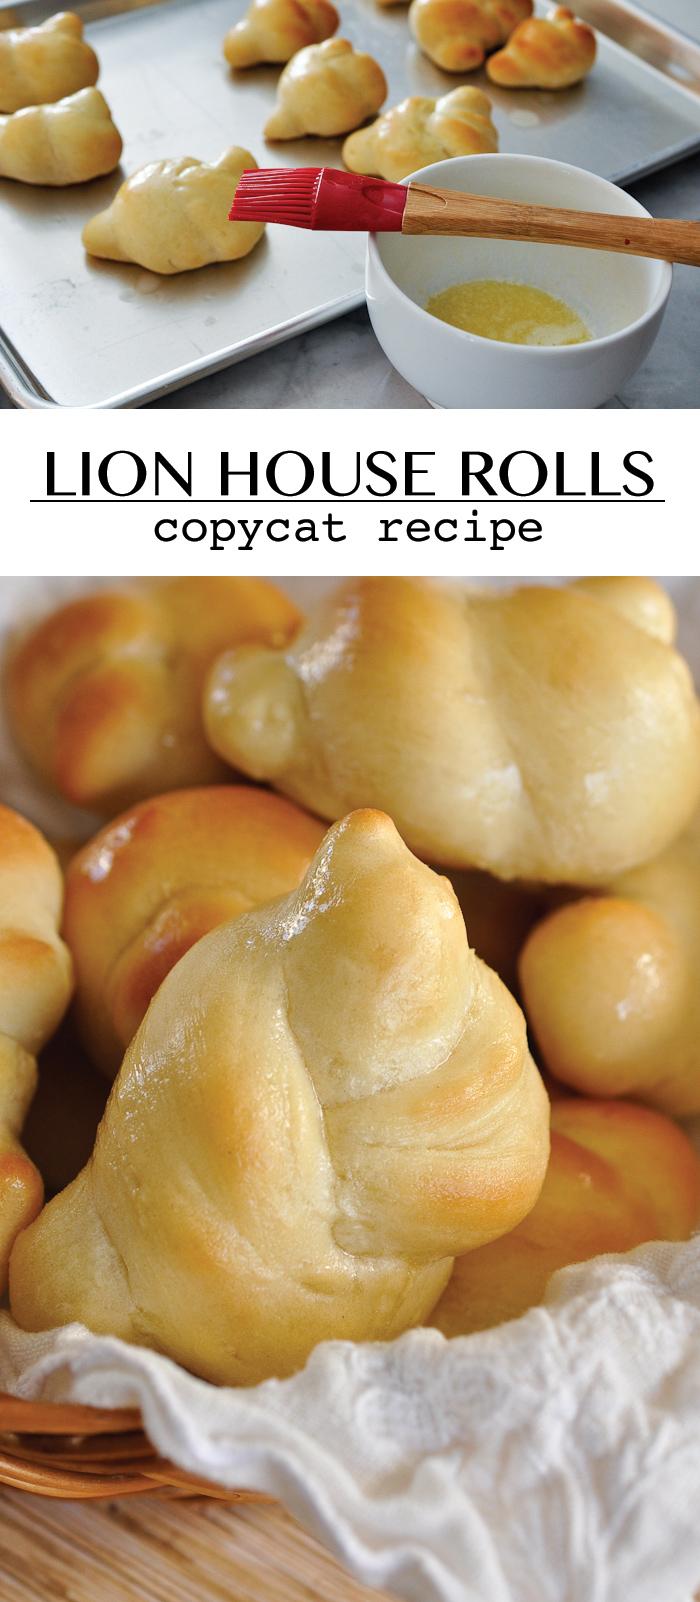 Lion House Rolls copycat recipe